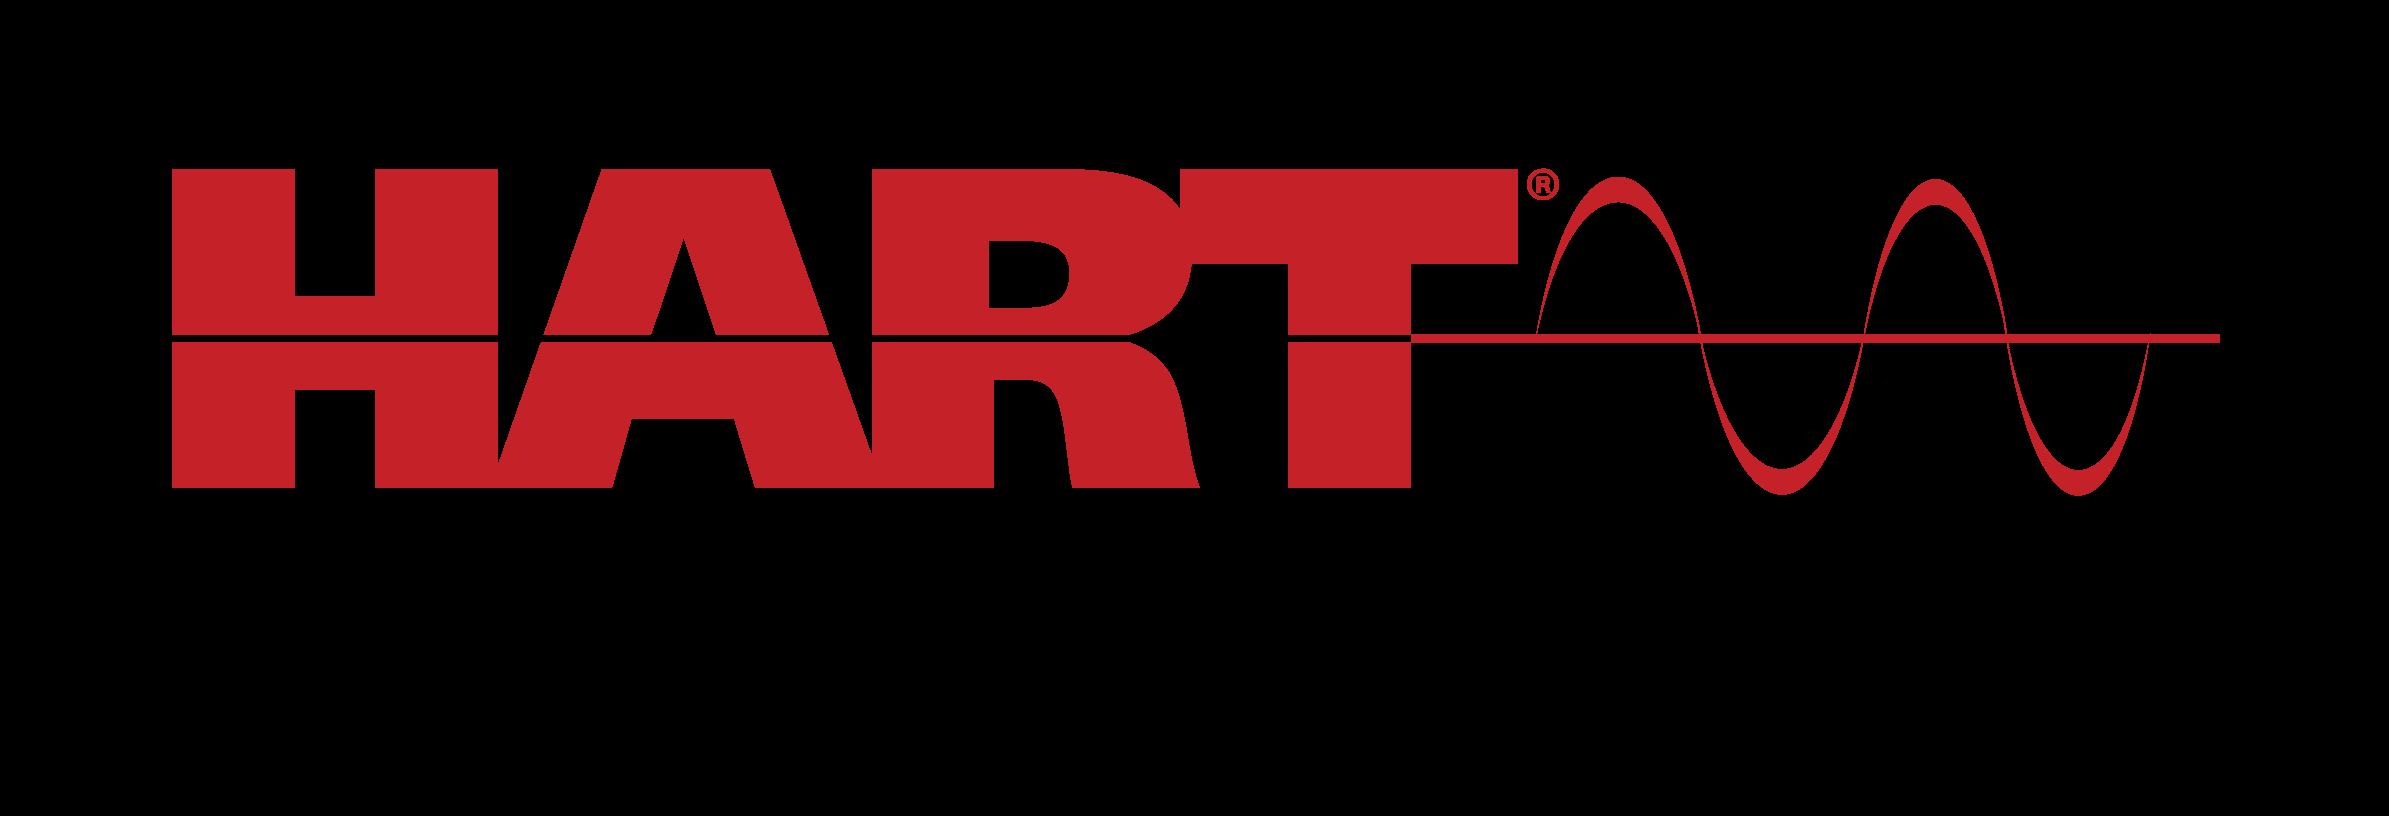 hart_protocol_logo_color_300dpi